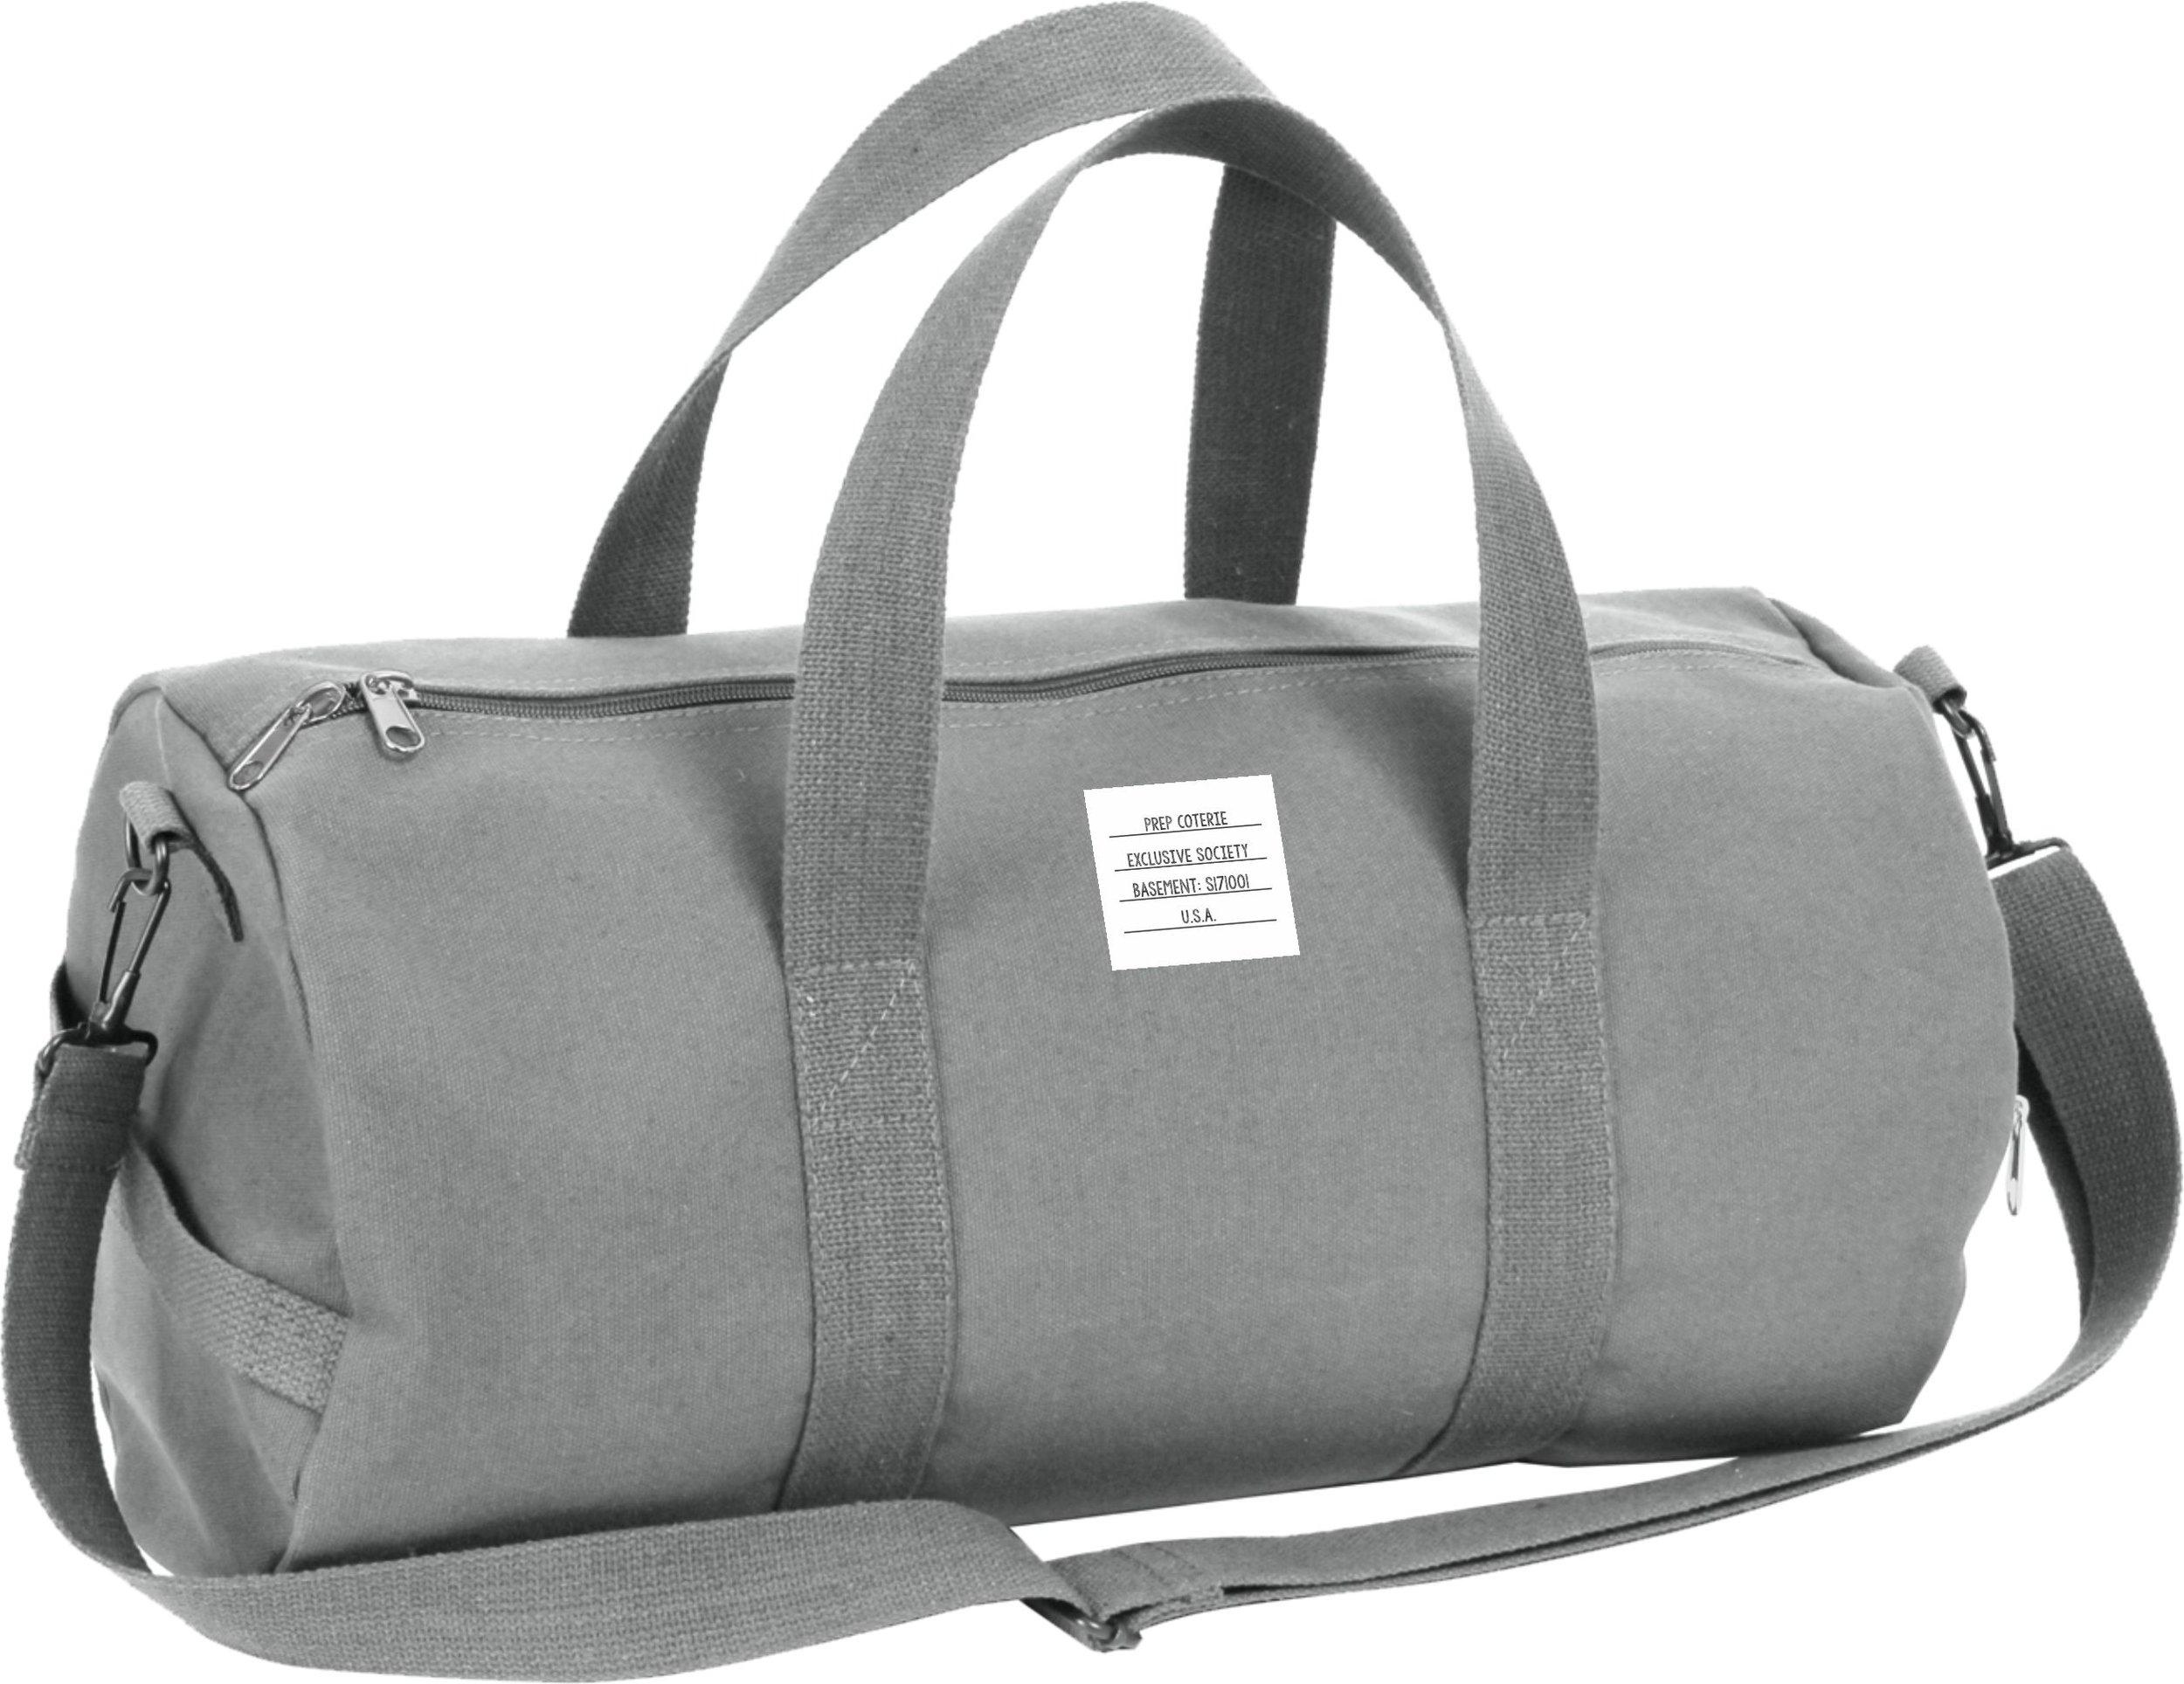 gray bag.jpg